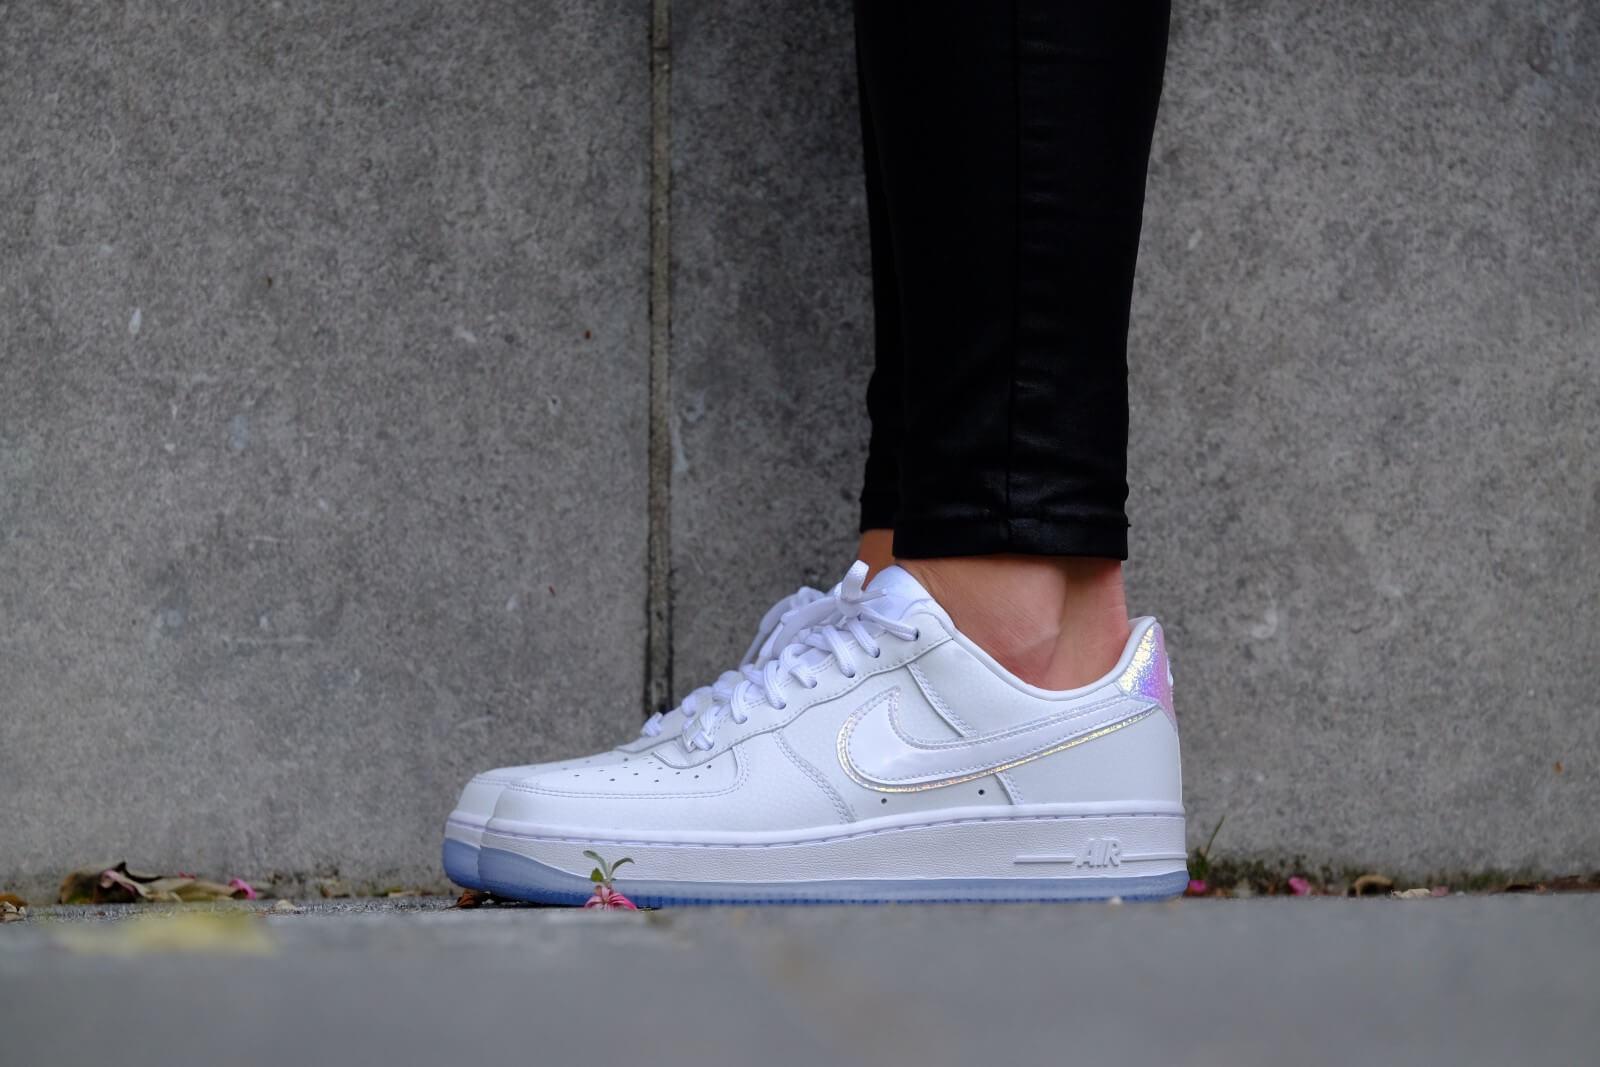 Nike WMNS Air Force 1 '07 PRM White